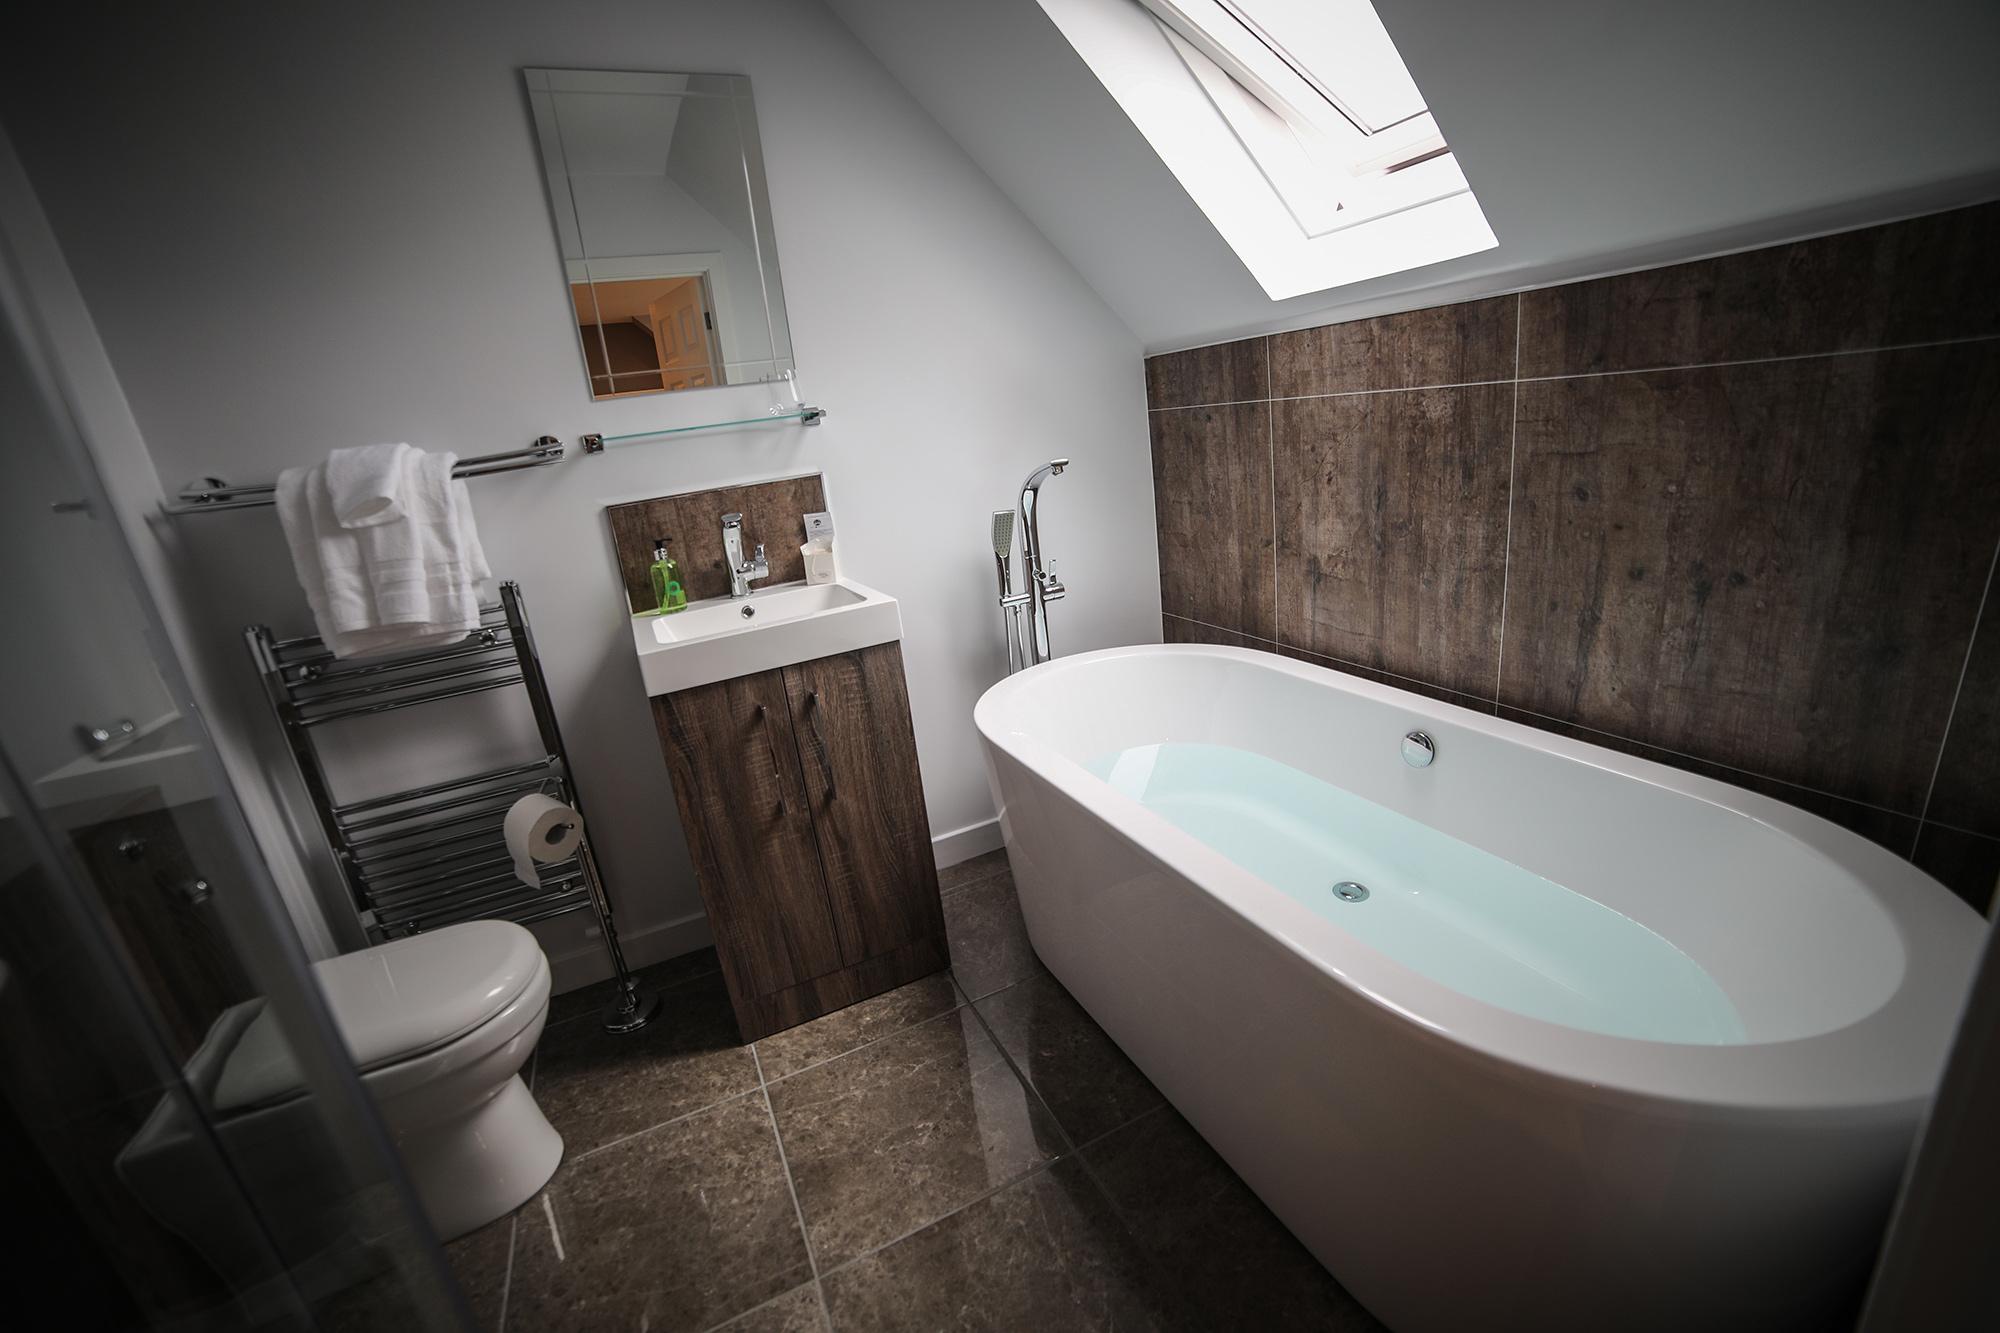 Bridge_Room_Bath_2.jpg